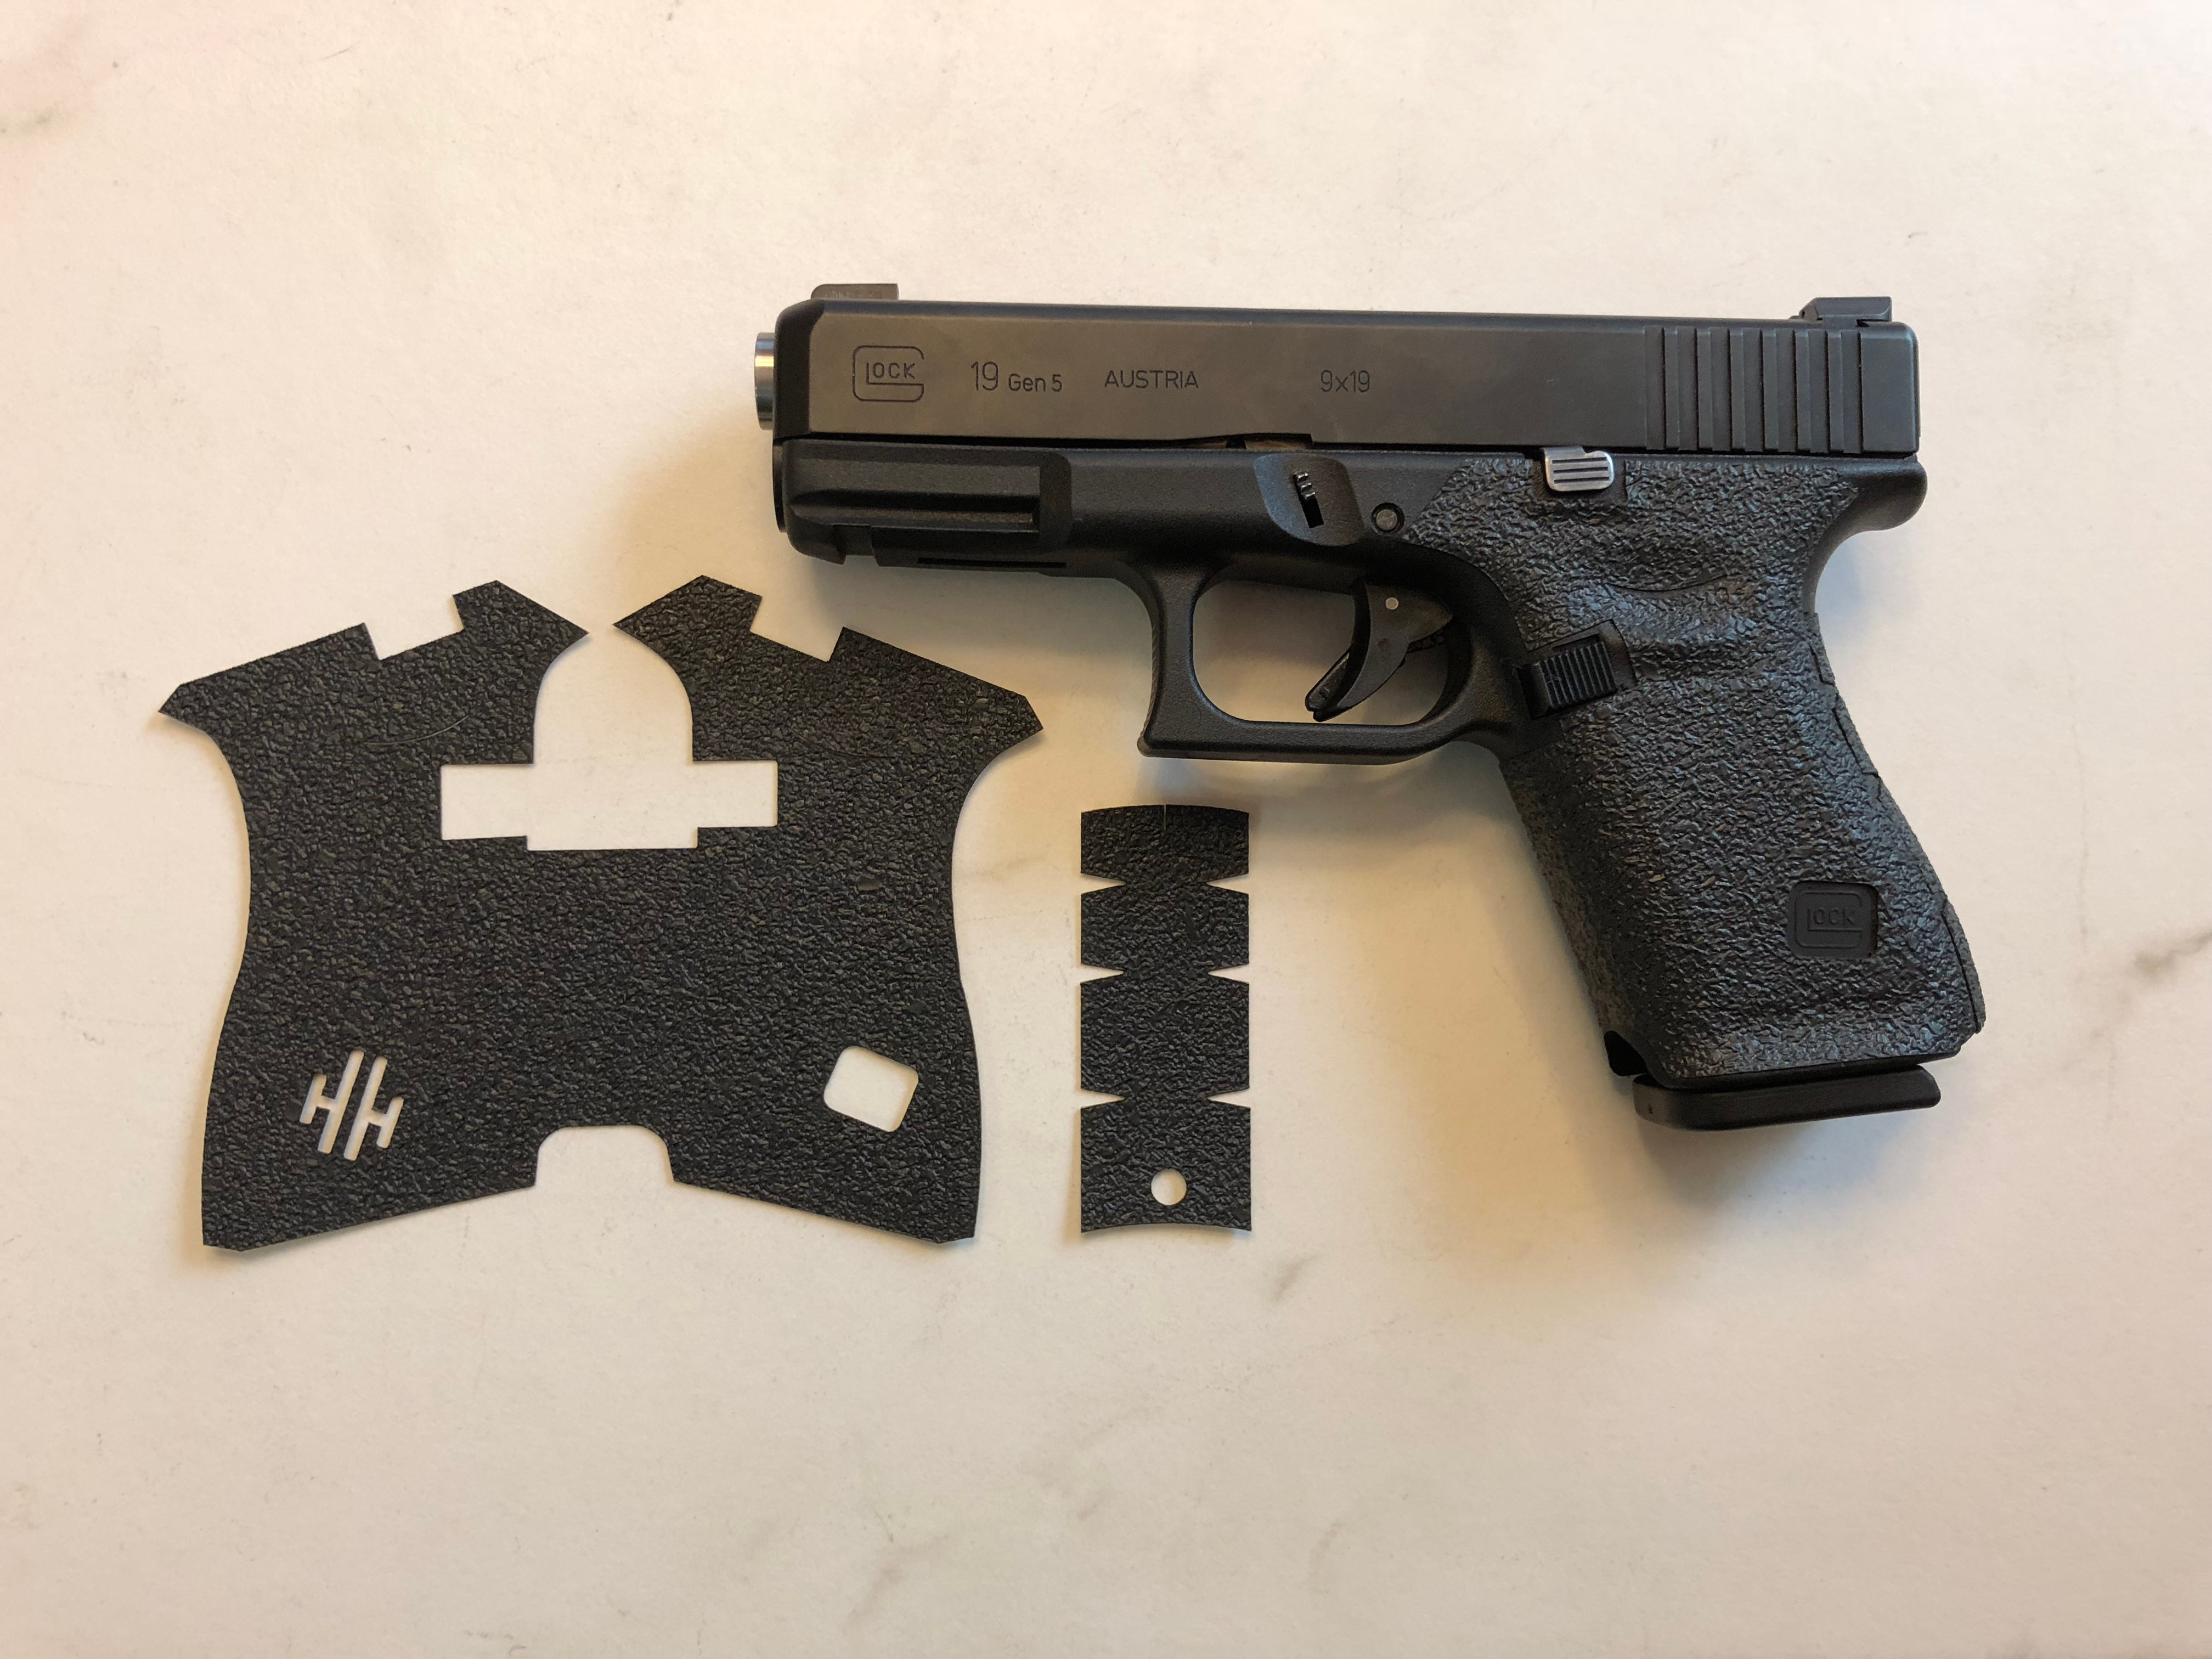 Glock 19/23 Gen 5 MOS Gun Grip Enhancement Gun Parts Kit